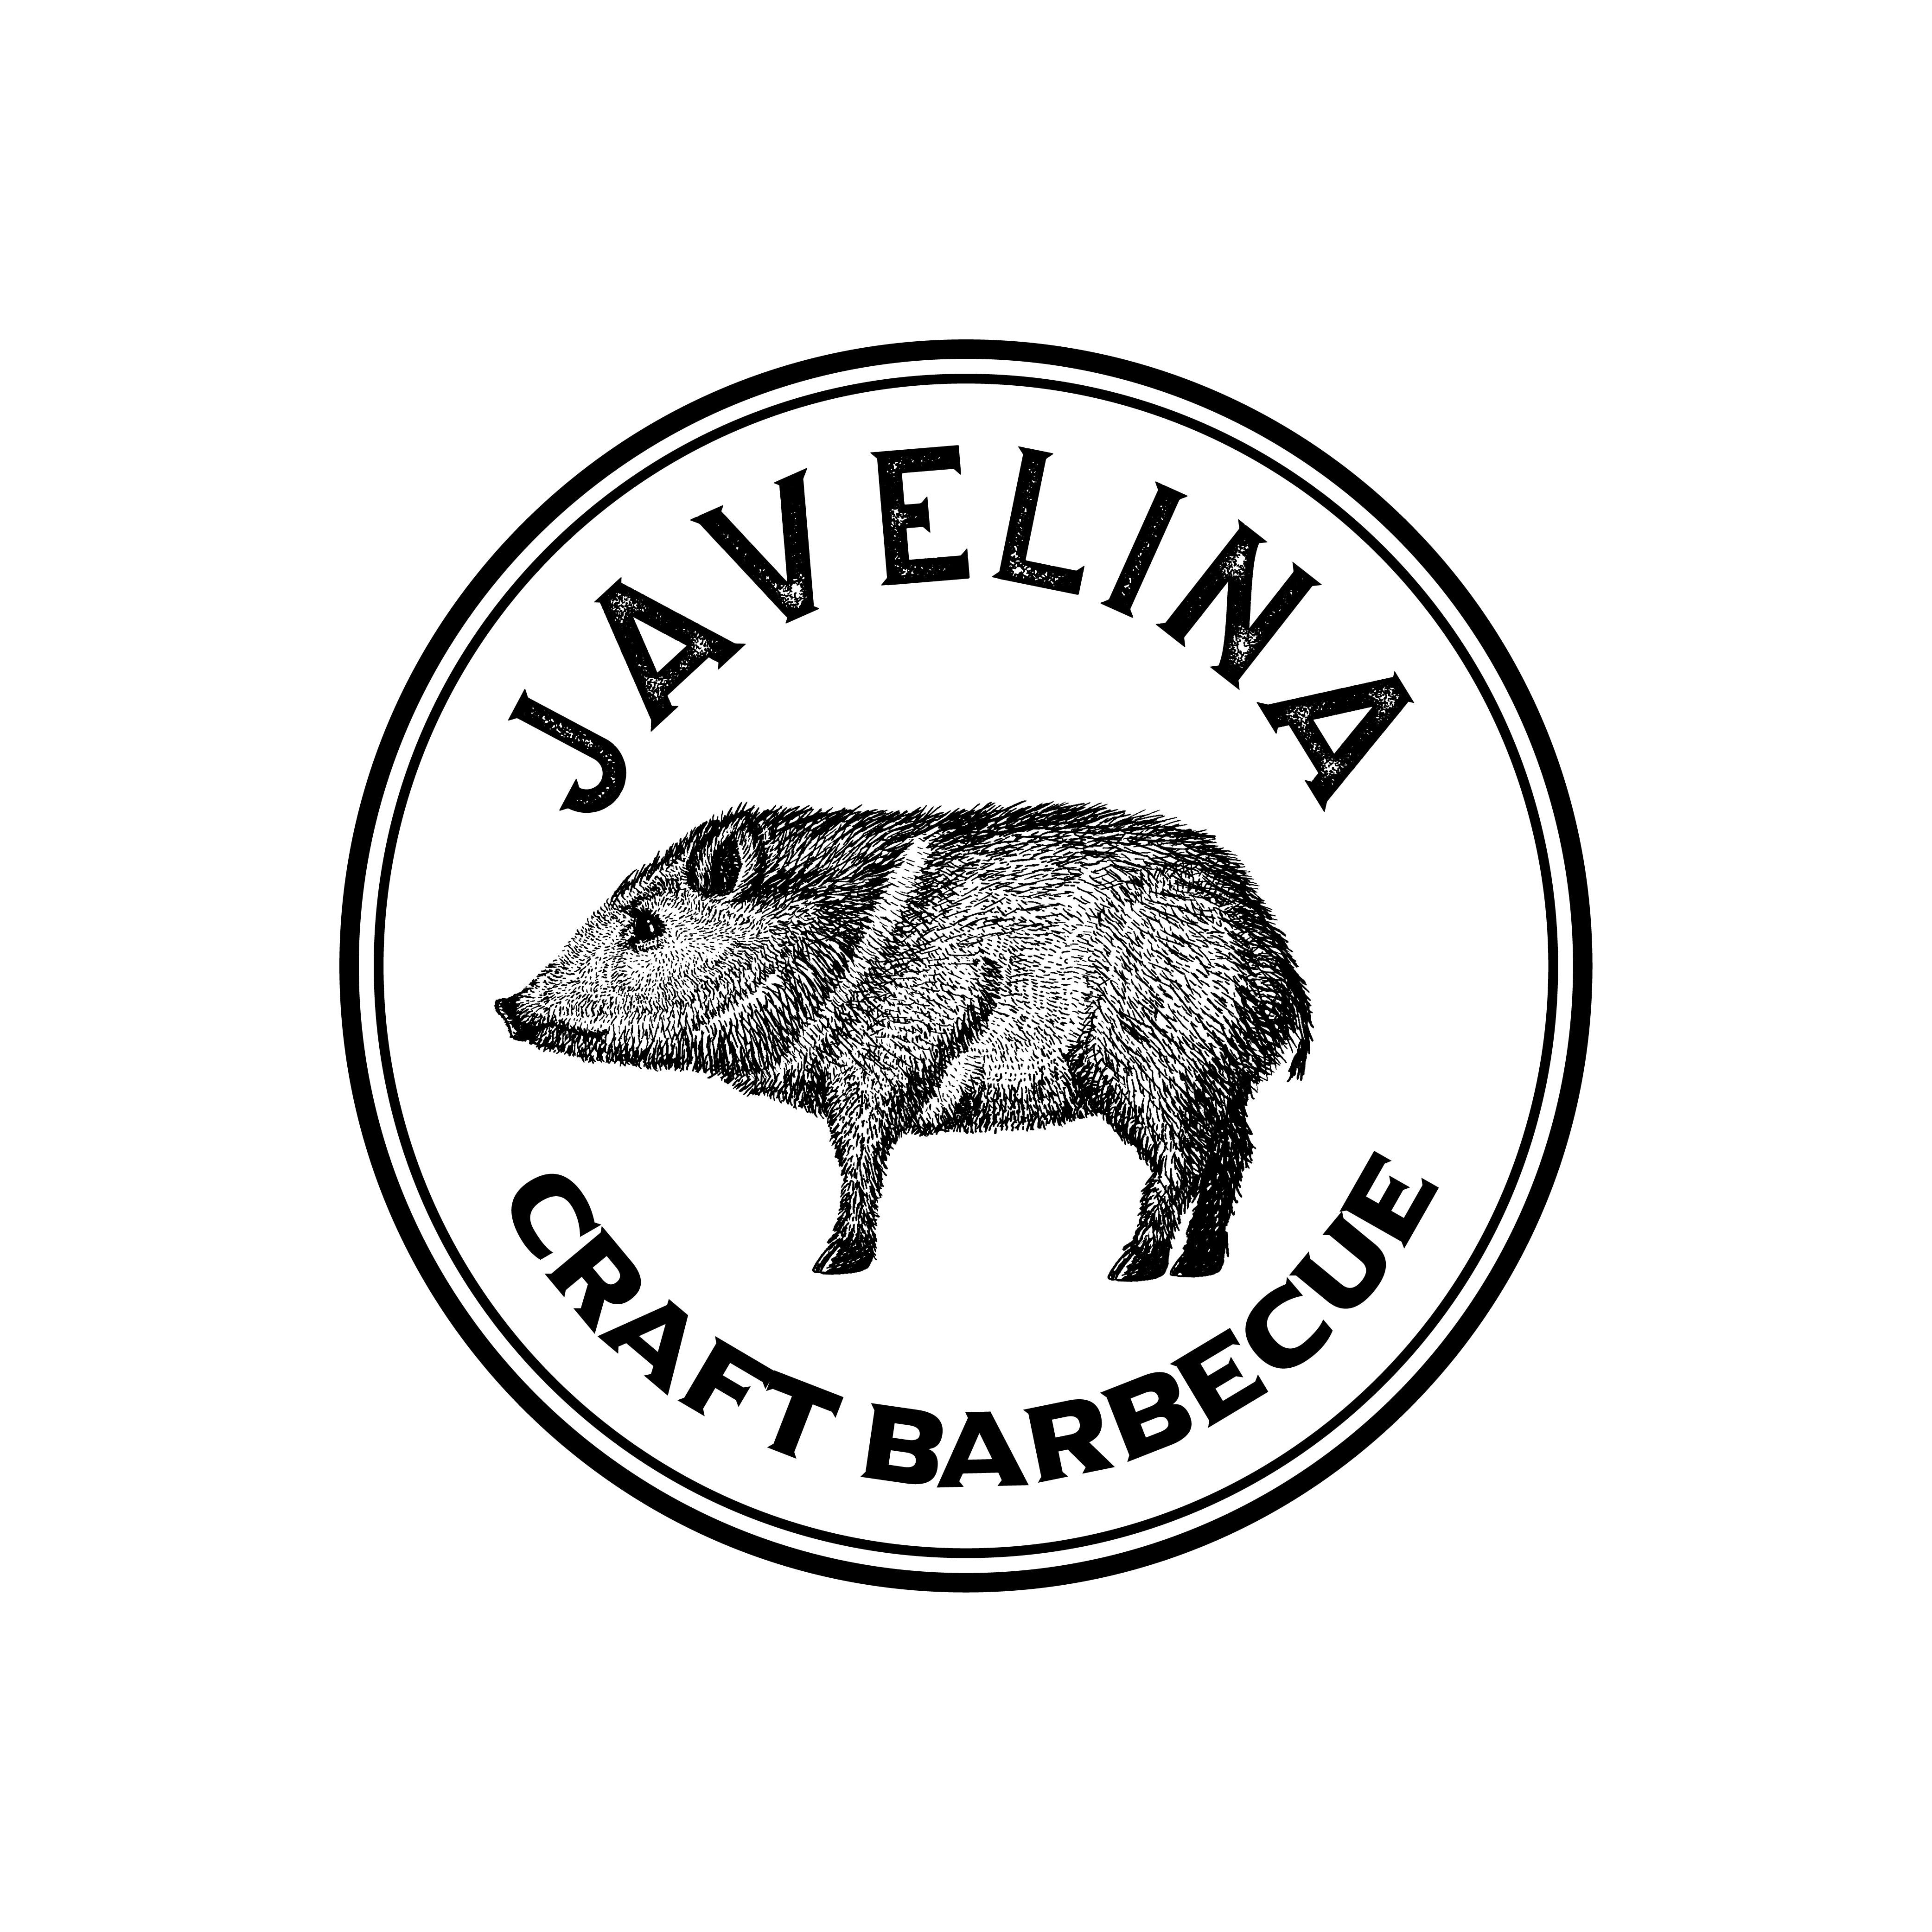 Design an original logo for a craft barbecue spot in Seattle